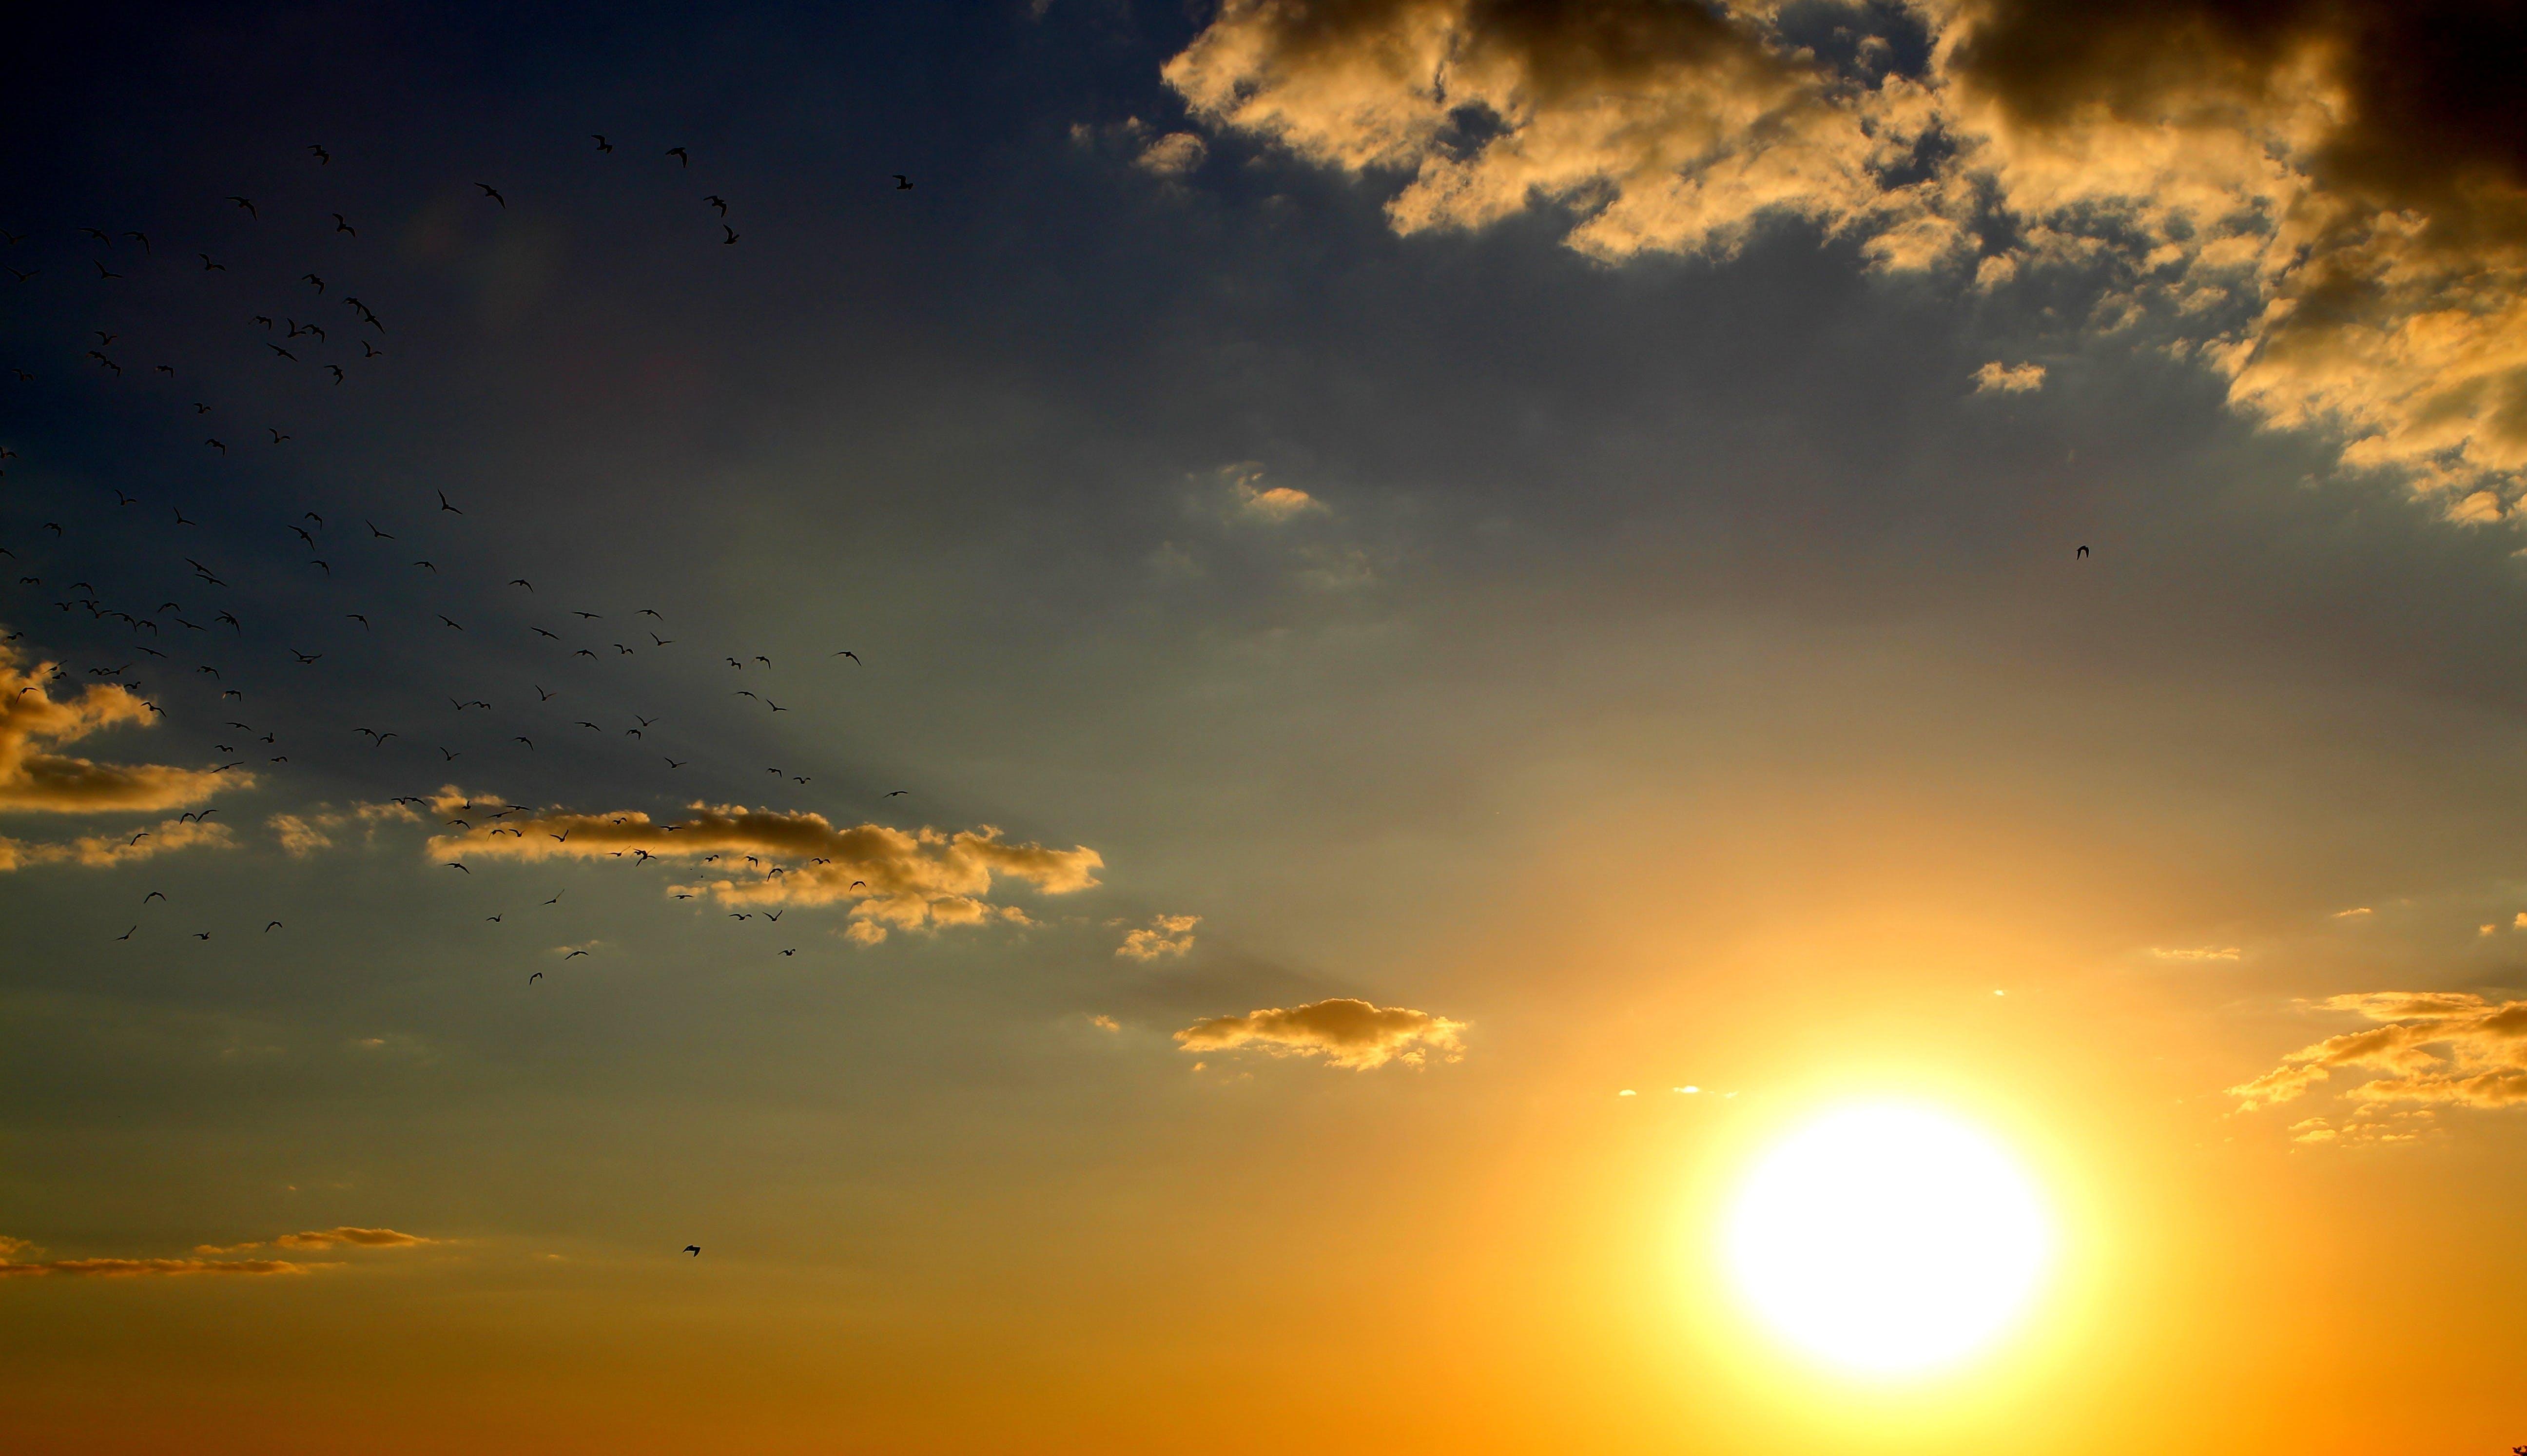 Golden Hour Photography